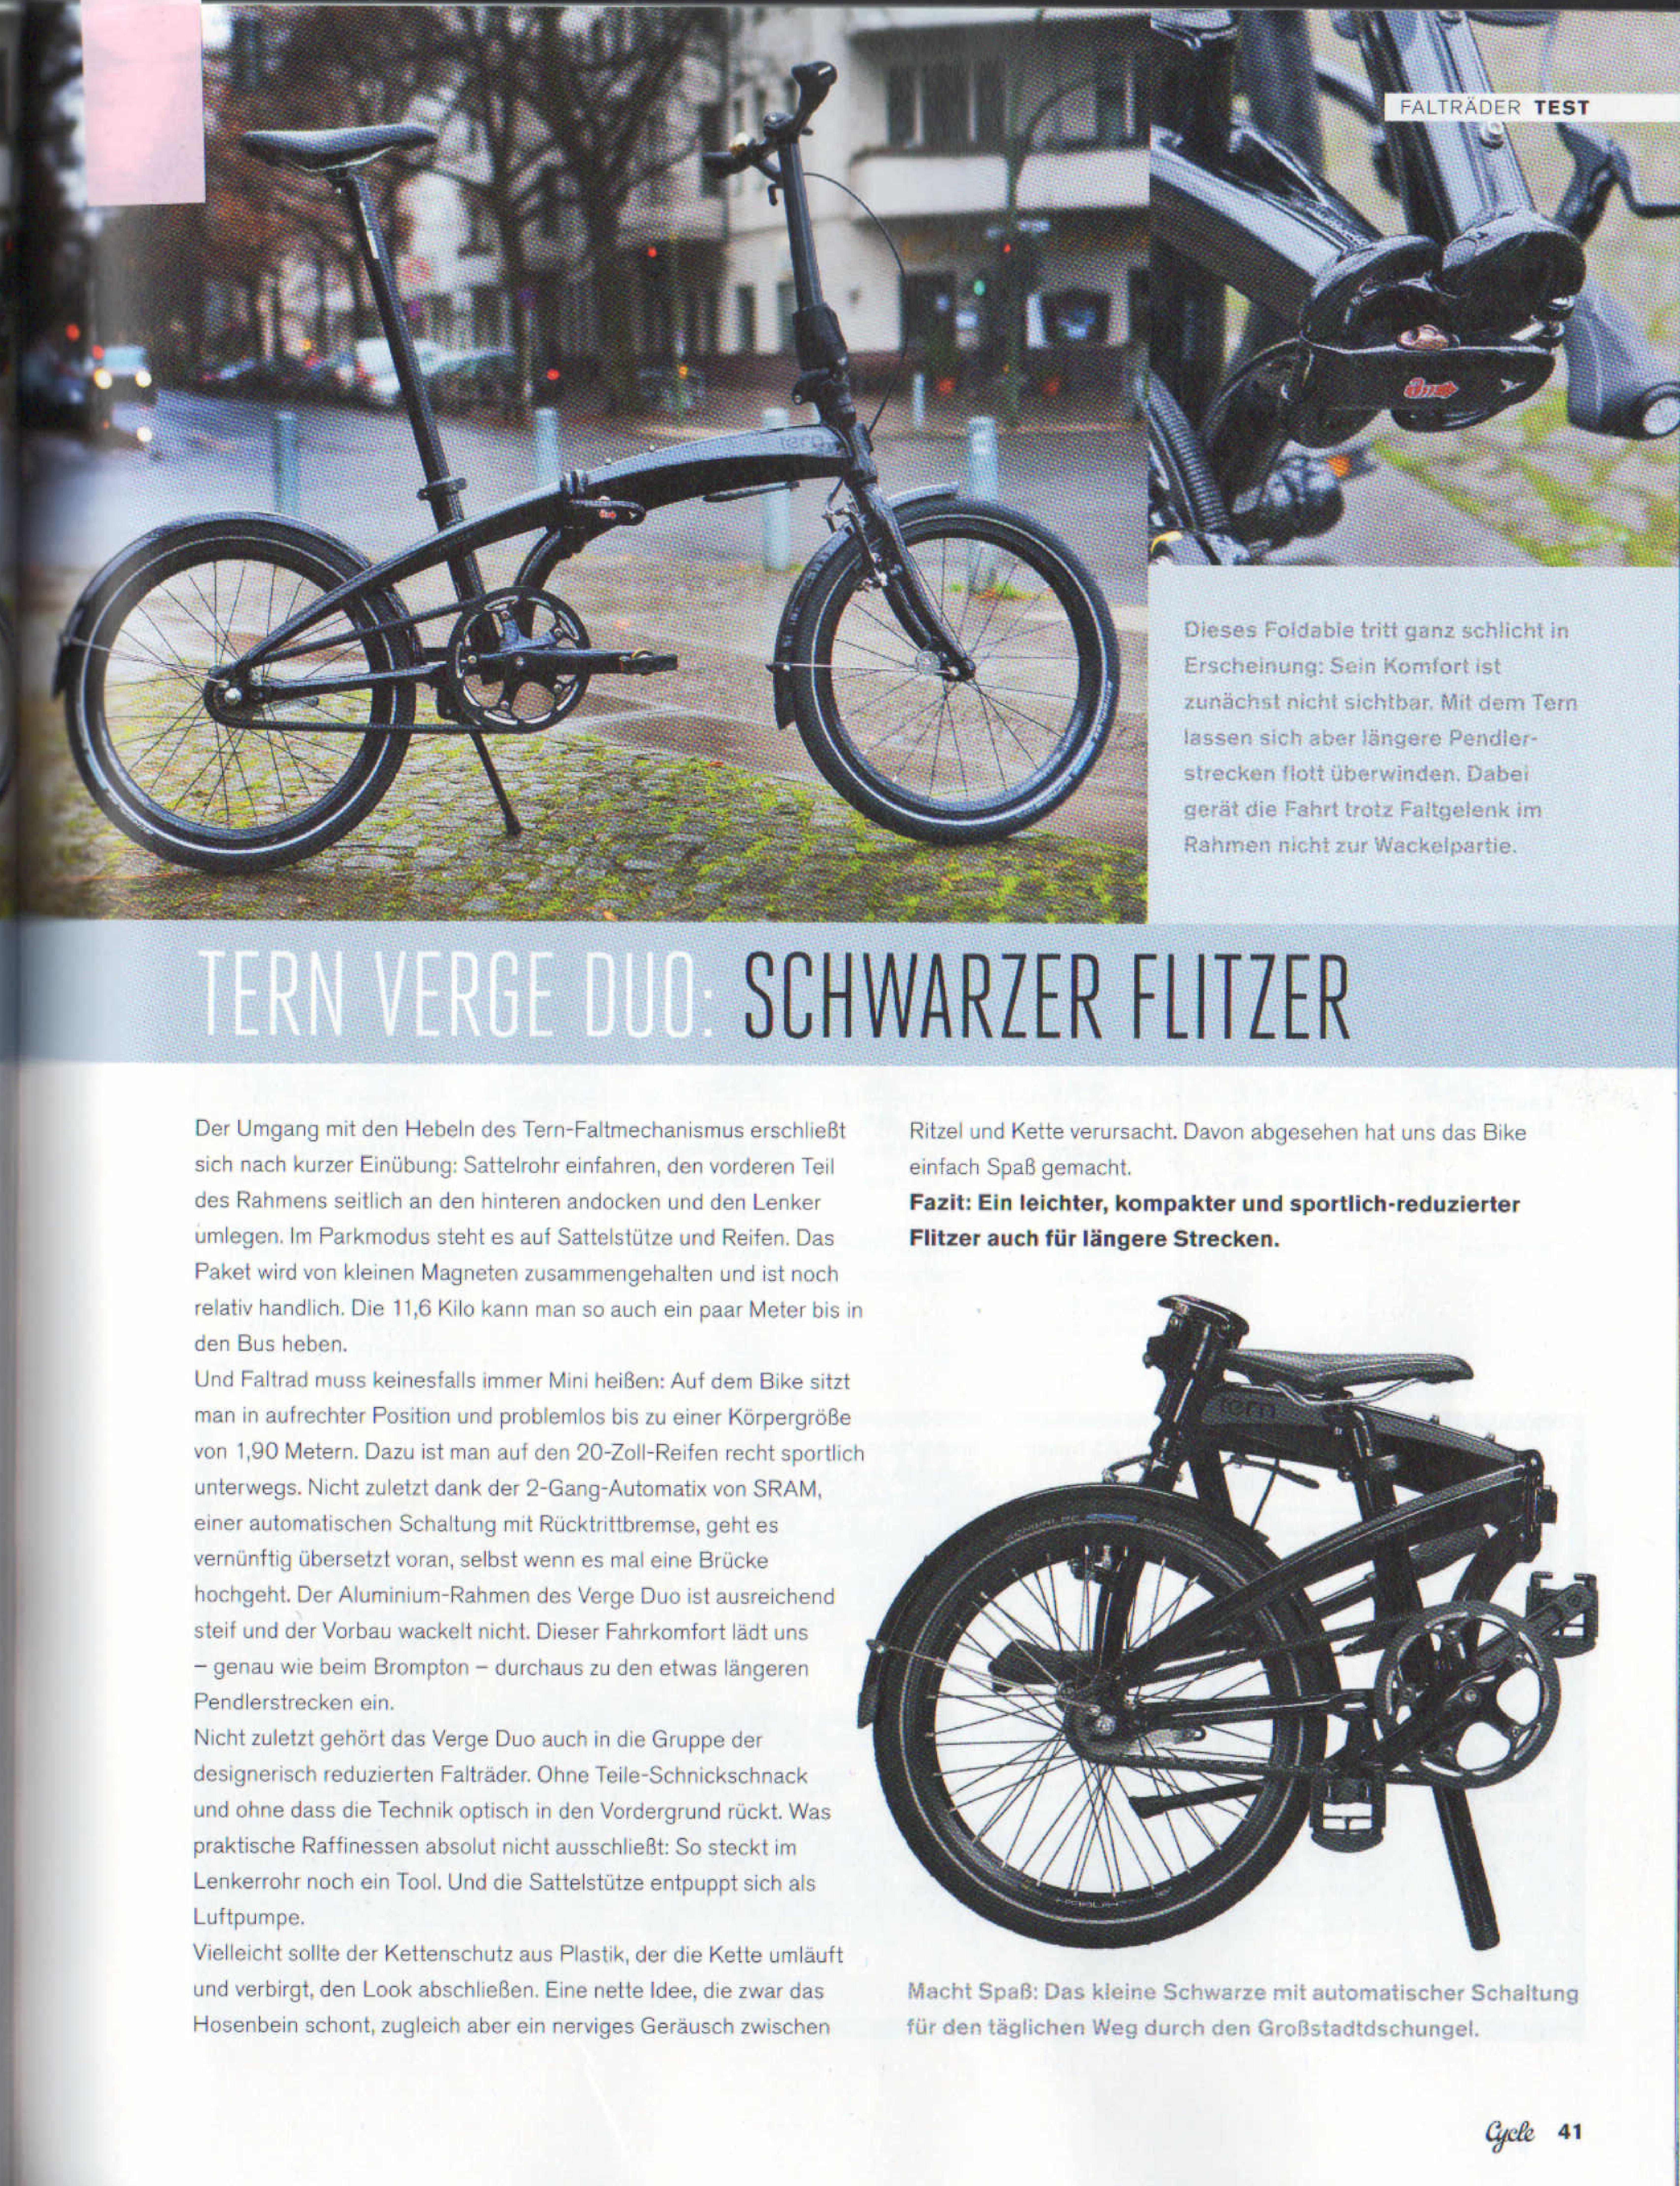 Tern Verge Duo: Schwarzer Flitzer | Tern Folding Bikes | Switzerland